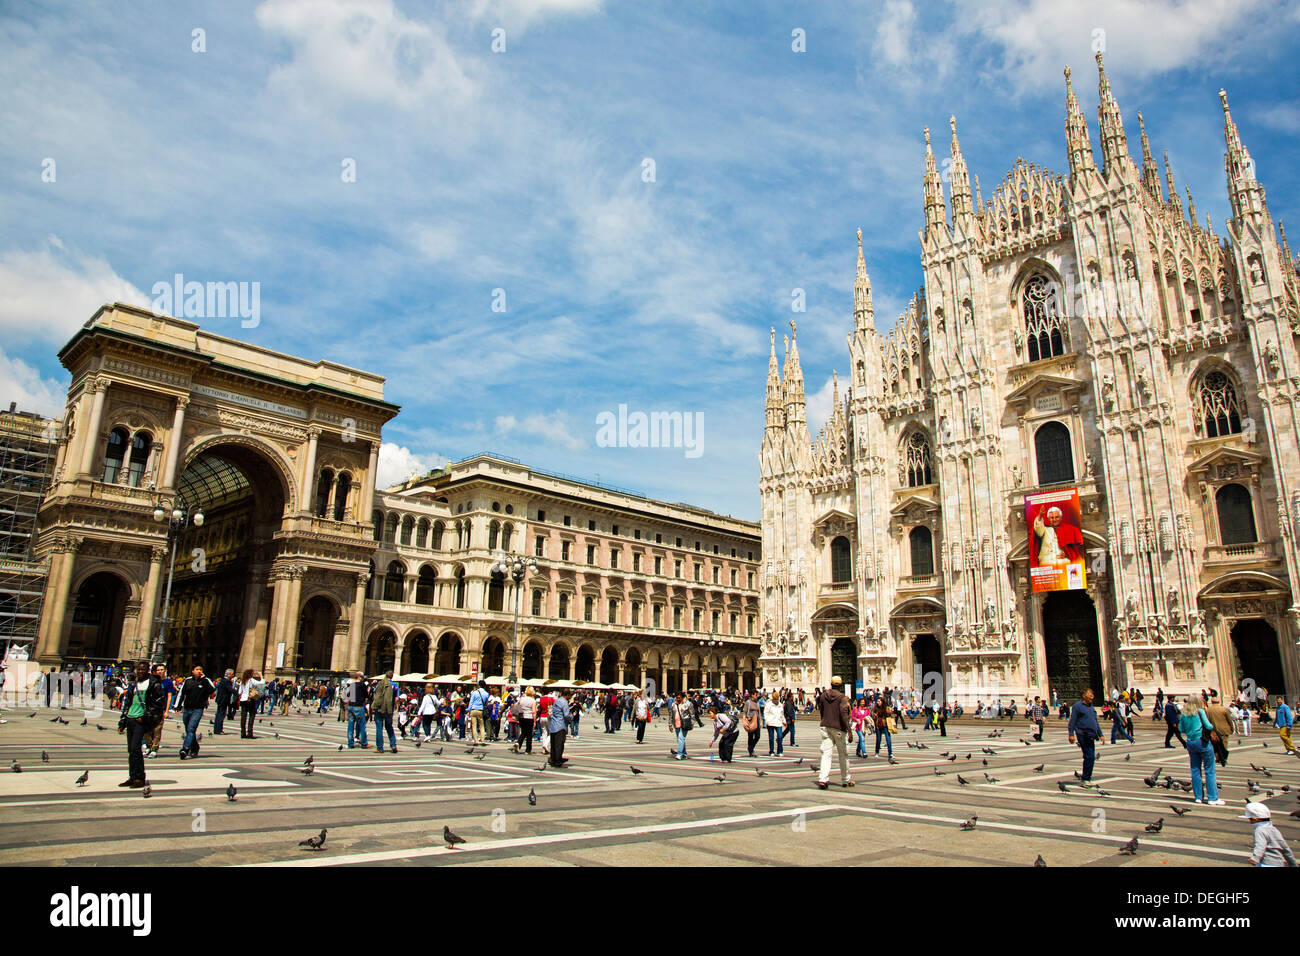 People at Duomo Di Milano, Milan, Lombardy, Italy - Stock Image